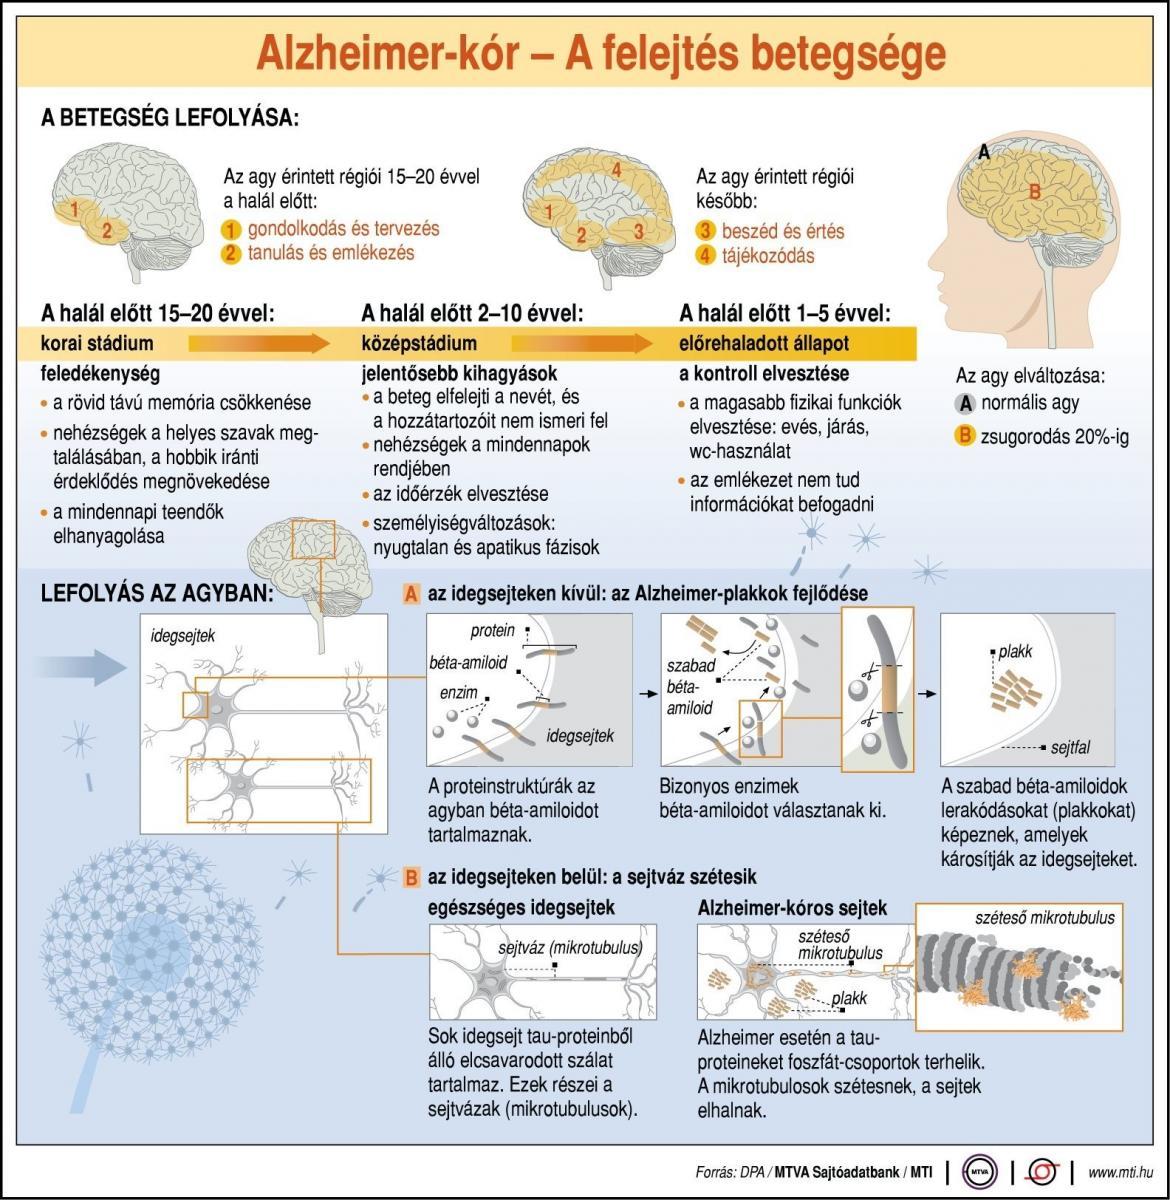 fogyás a demencia korai jele